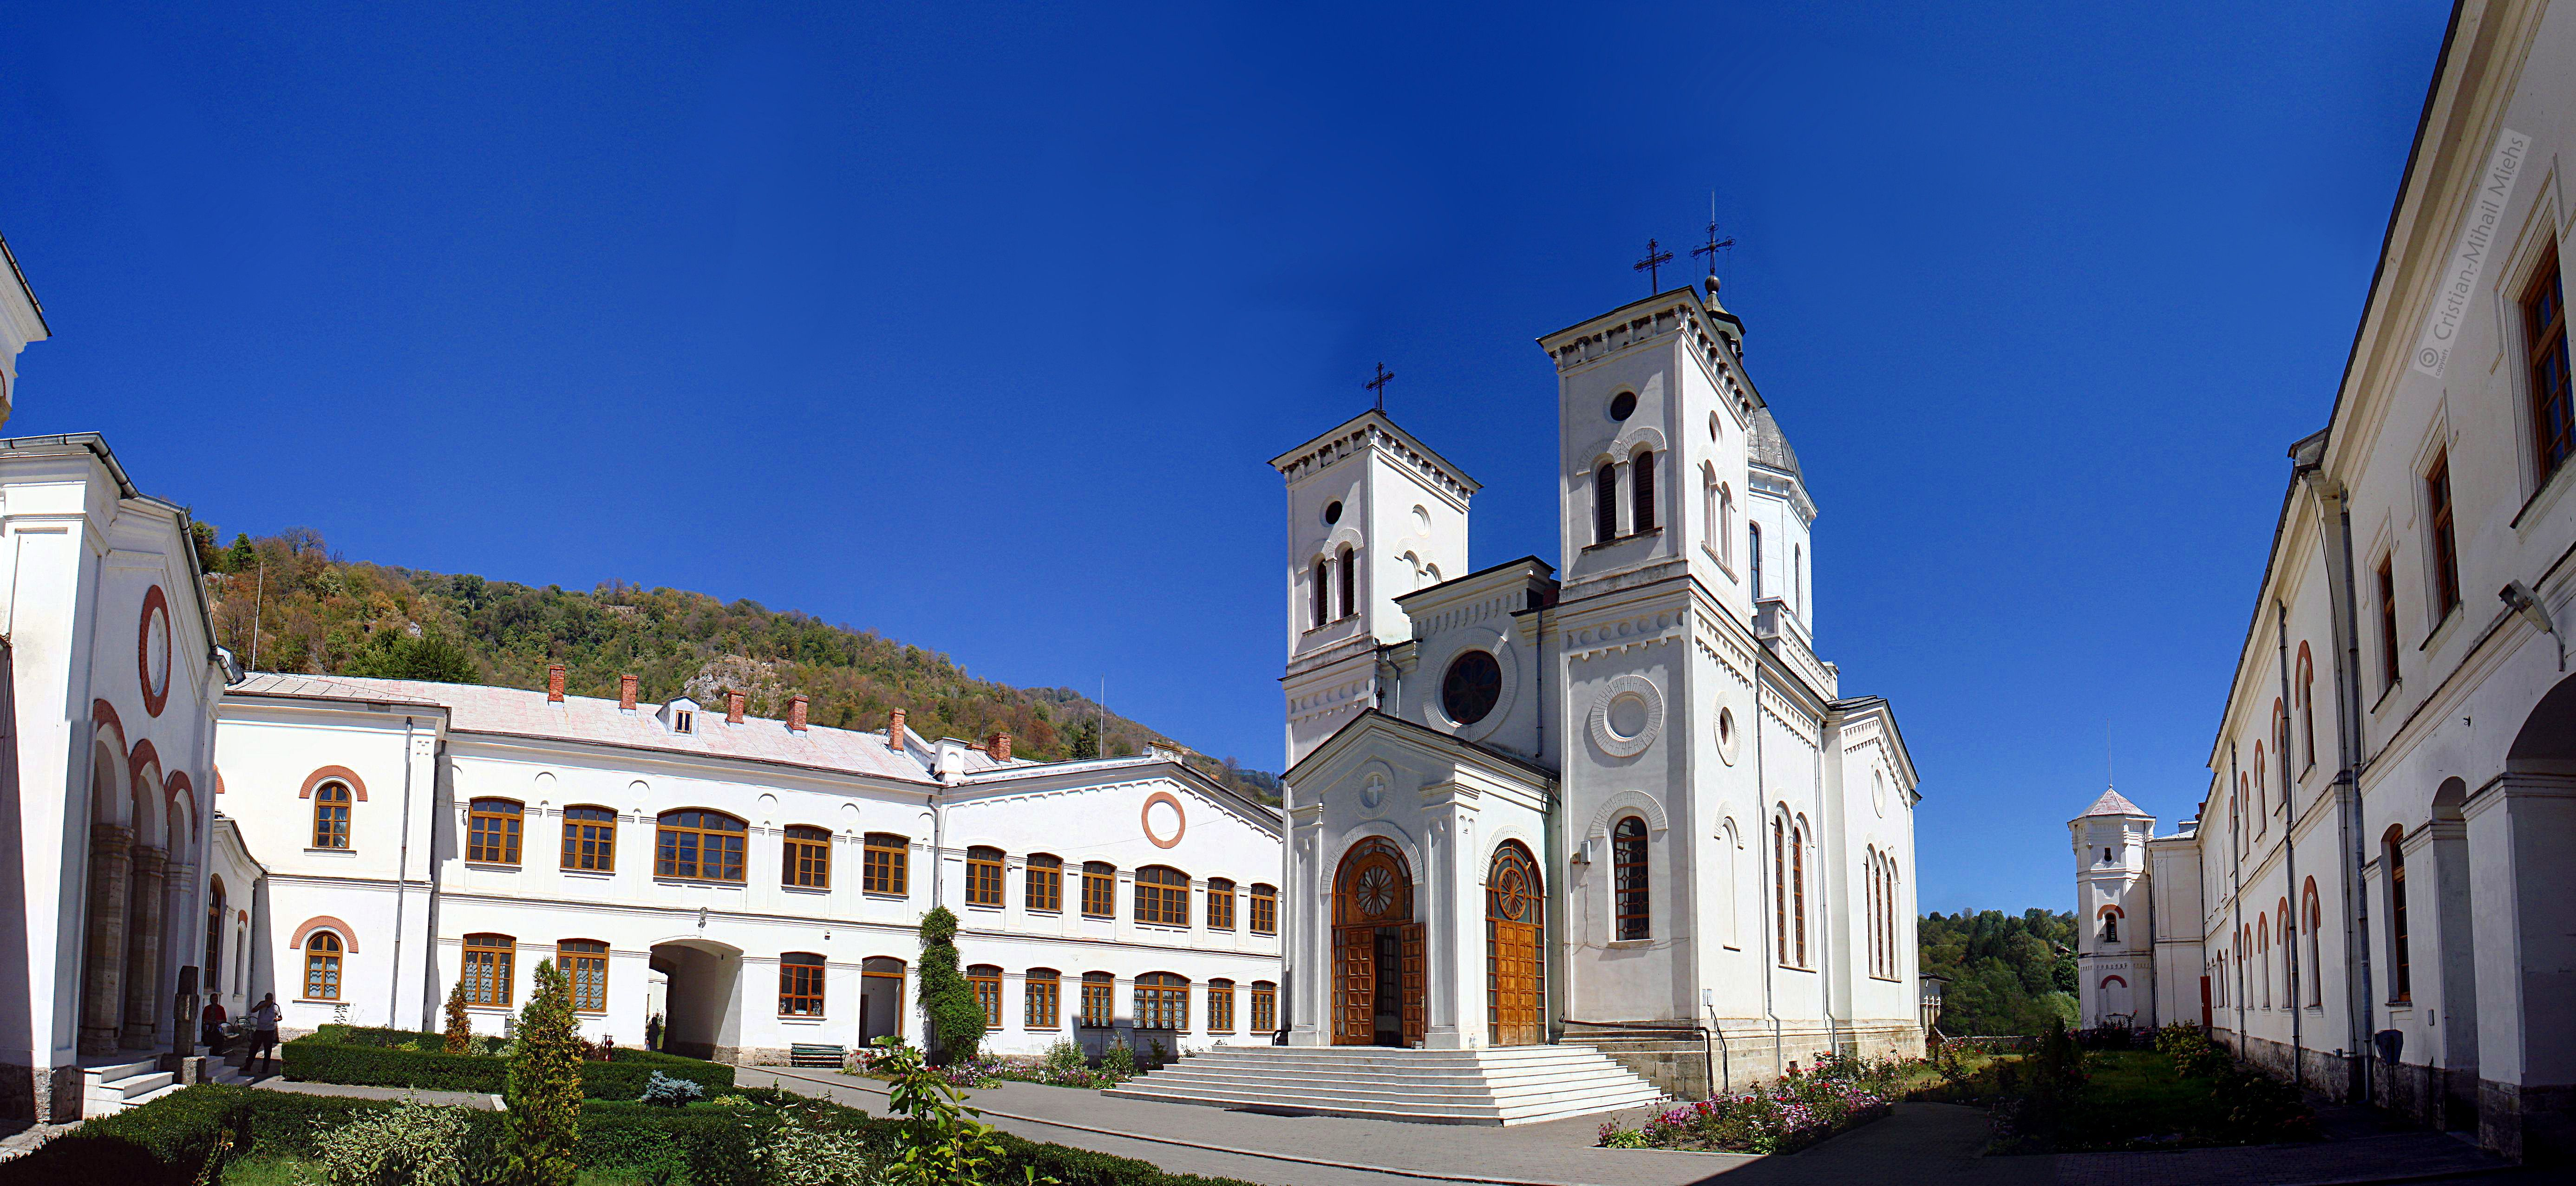 Manastirea_Bistrita-Valcea-vedere_de_ansamblu